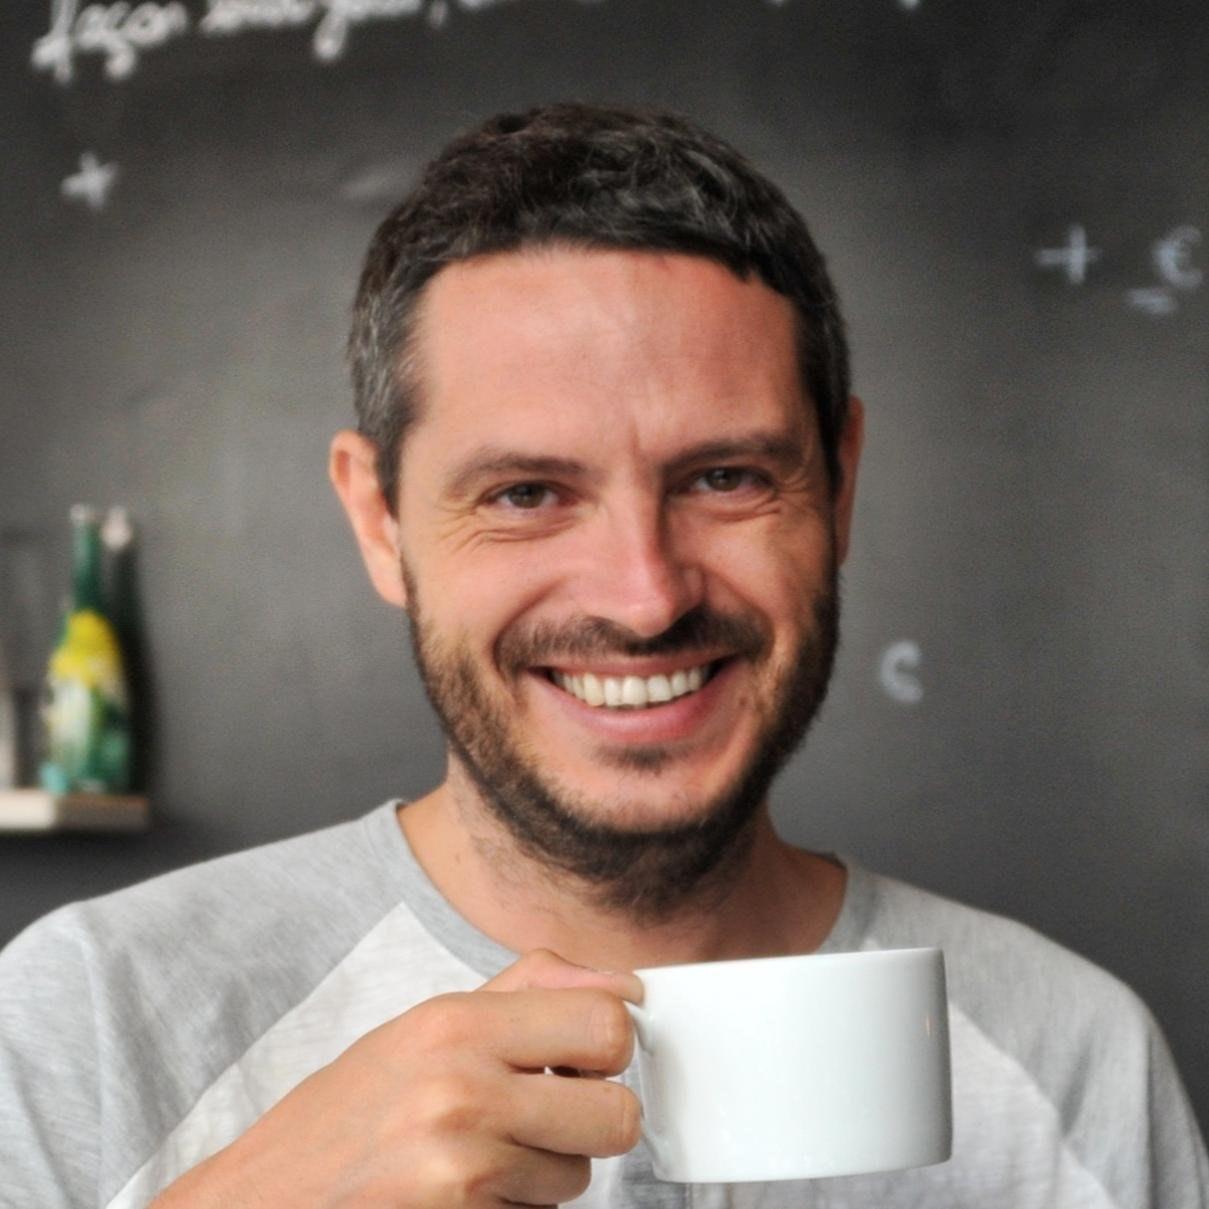 Daniel Laskowski